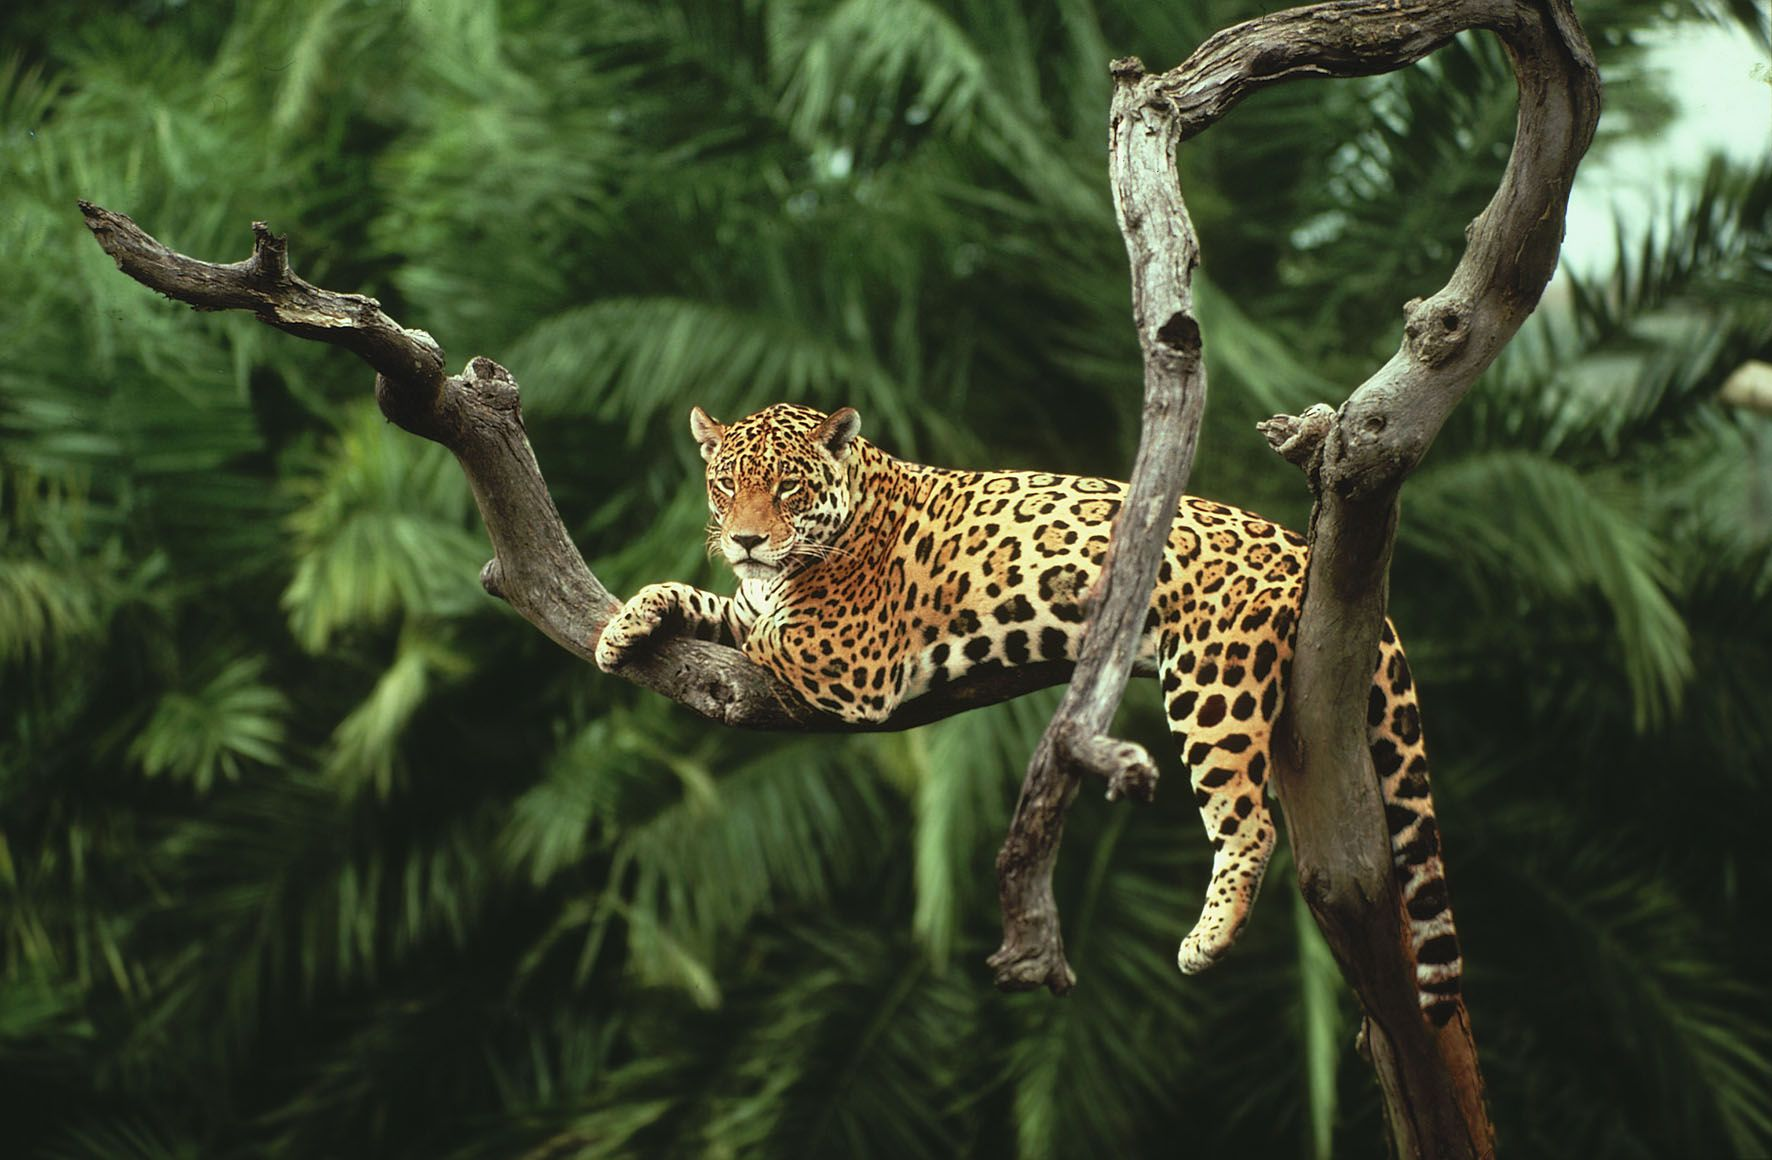 Amazon Rainforest Jaguar in the Amazon Dhrcom Blog